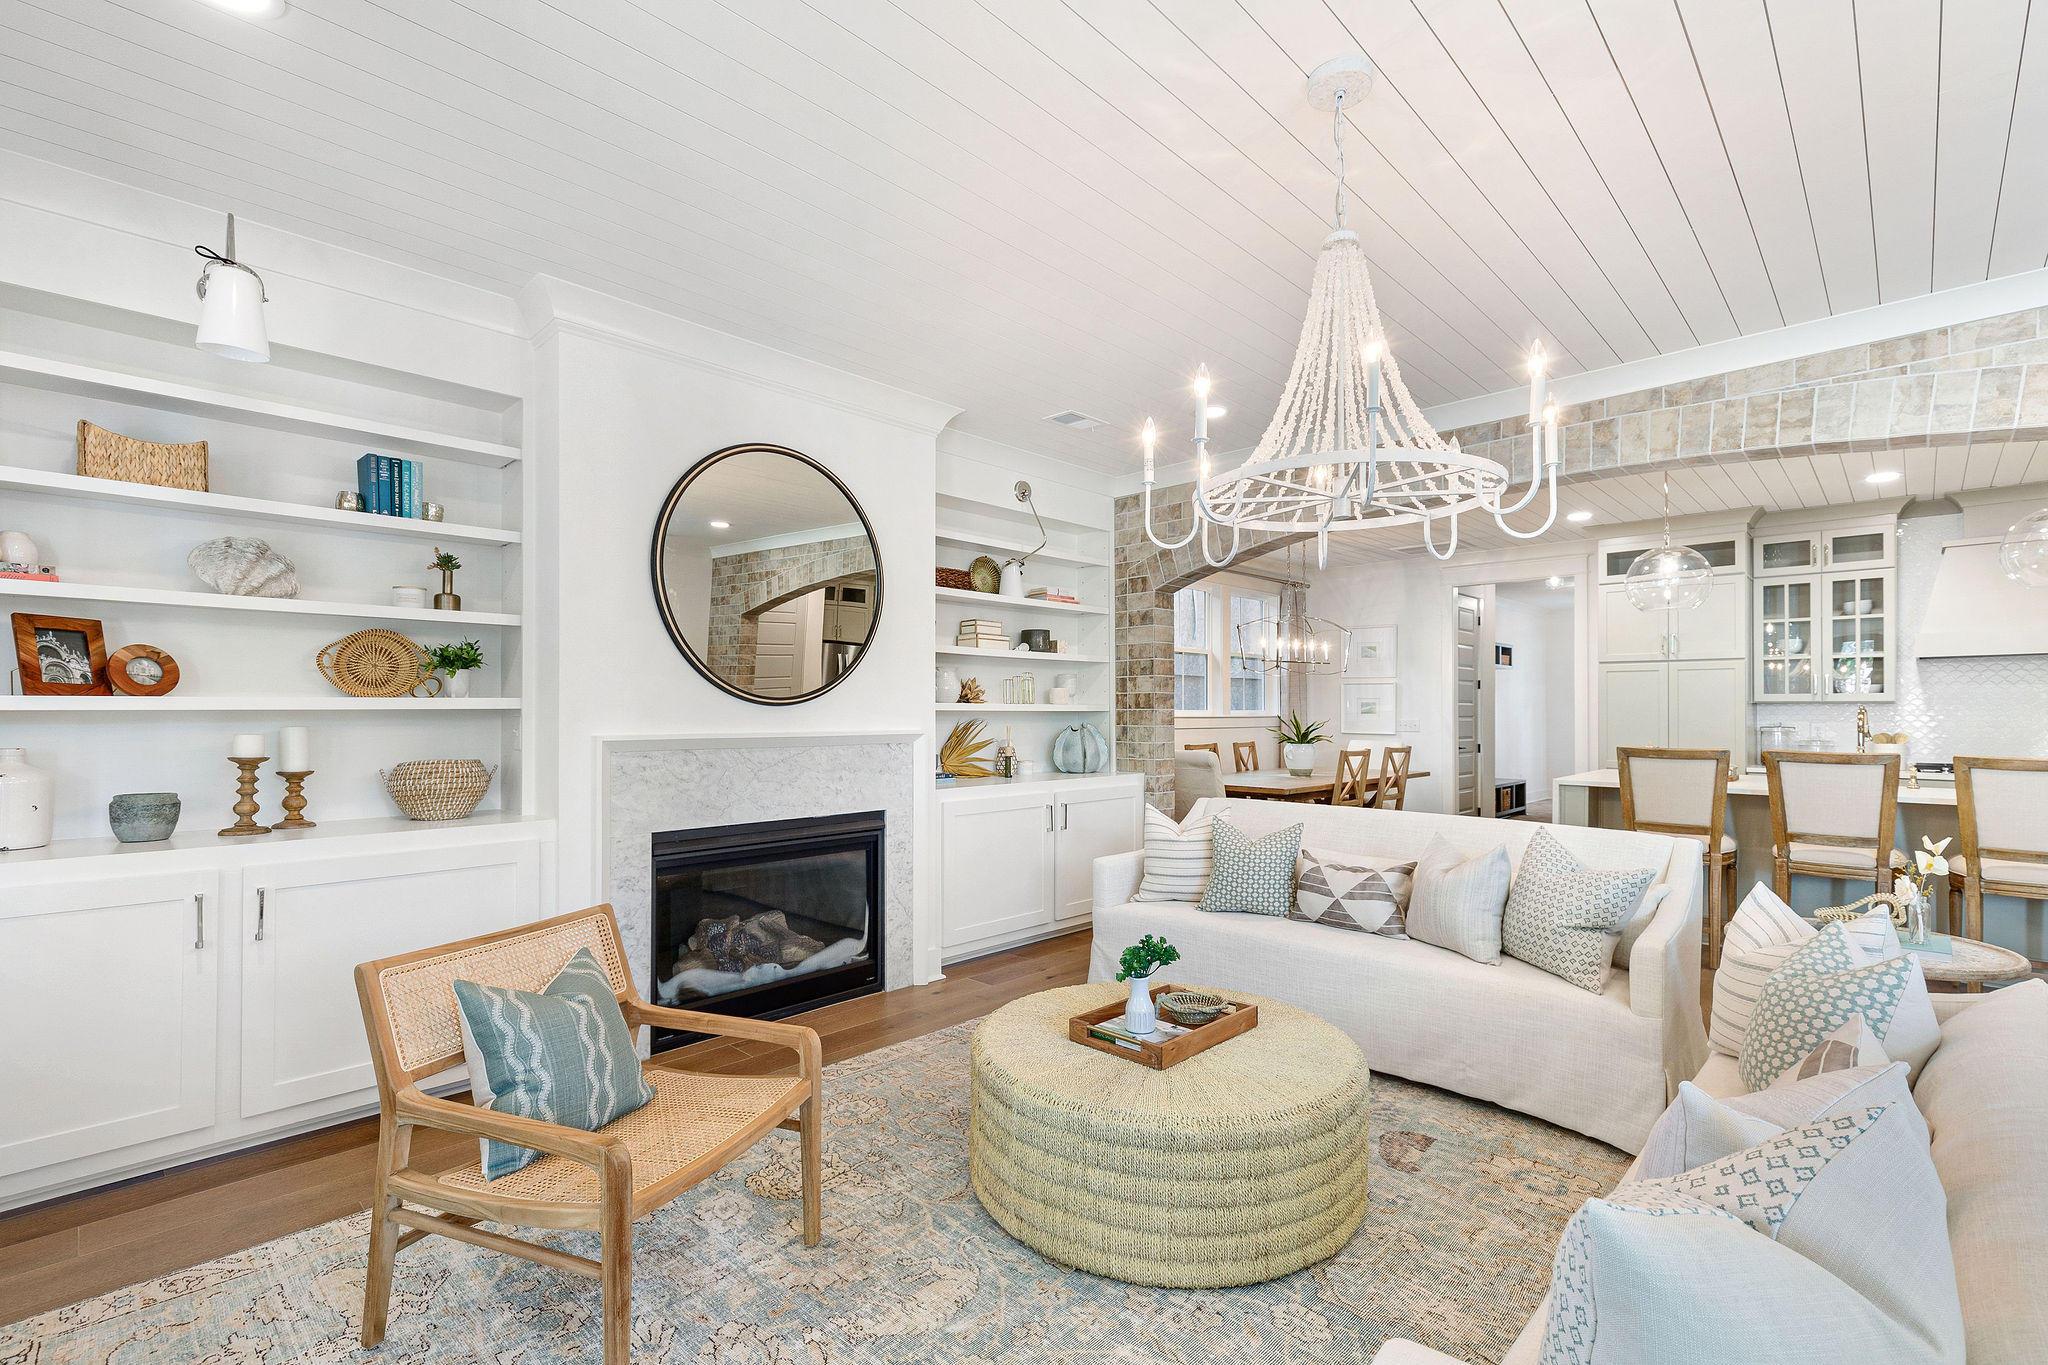 Avenue of Oaks Homes For Sale - 1027 Avenue Of Oaks, Charleston, SC - 42